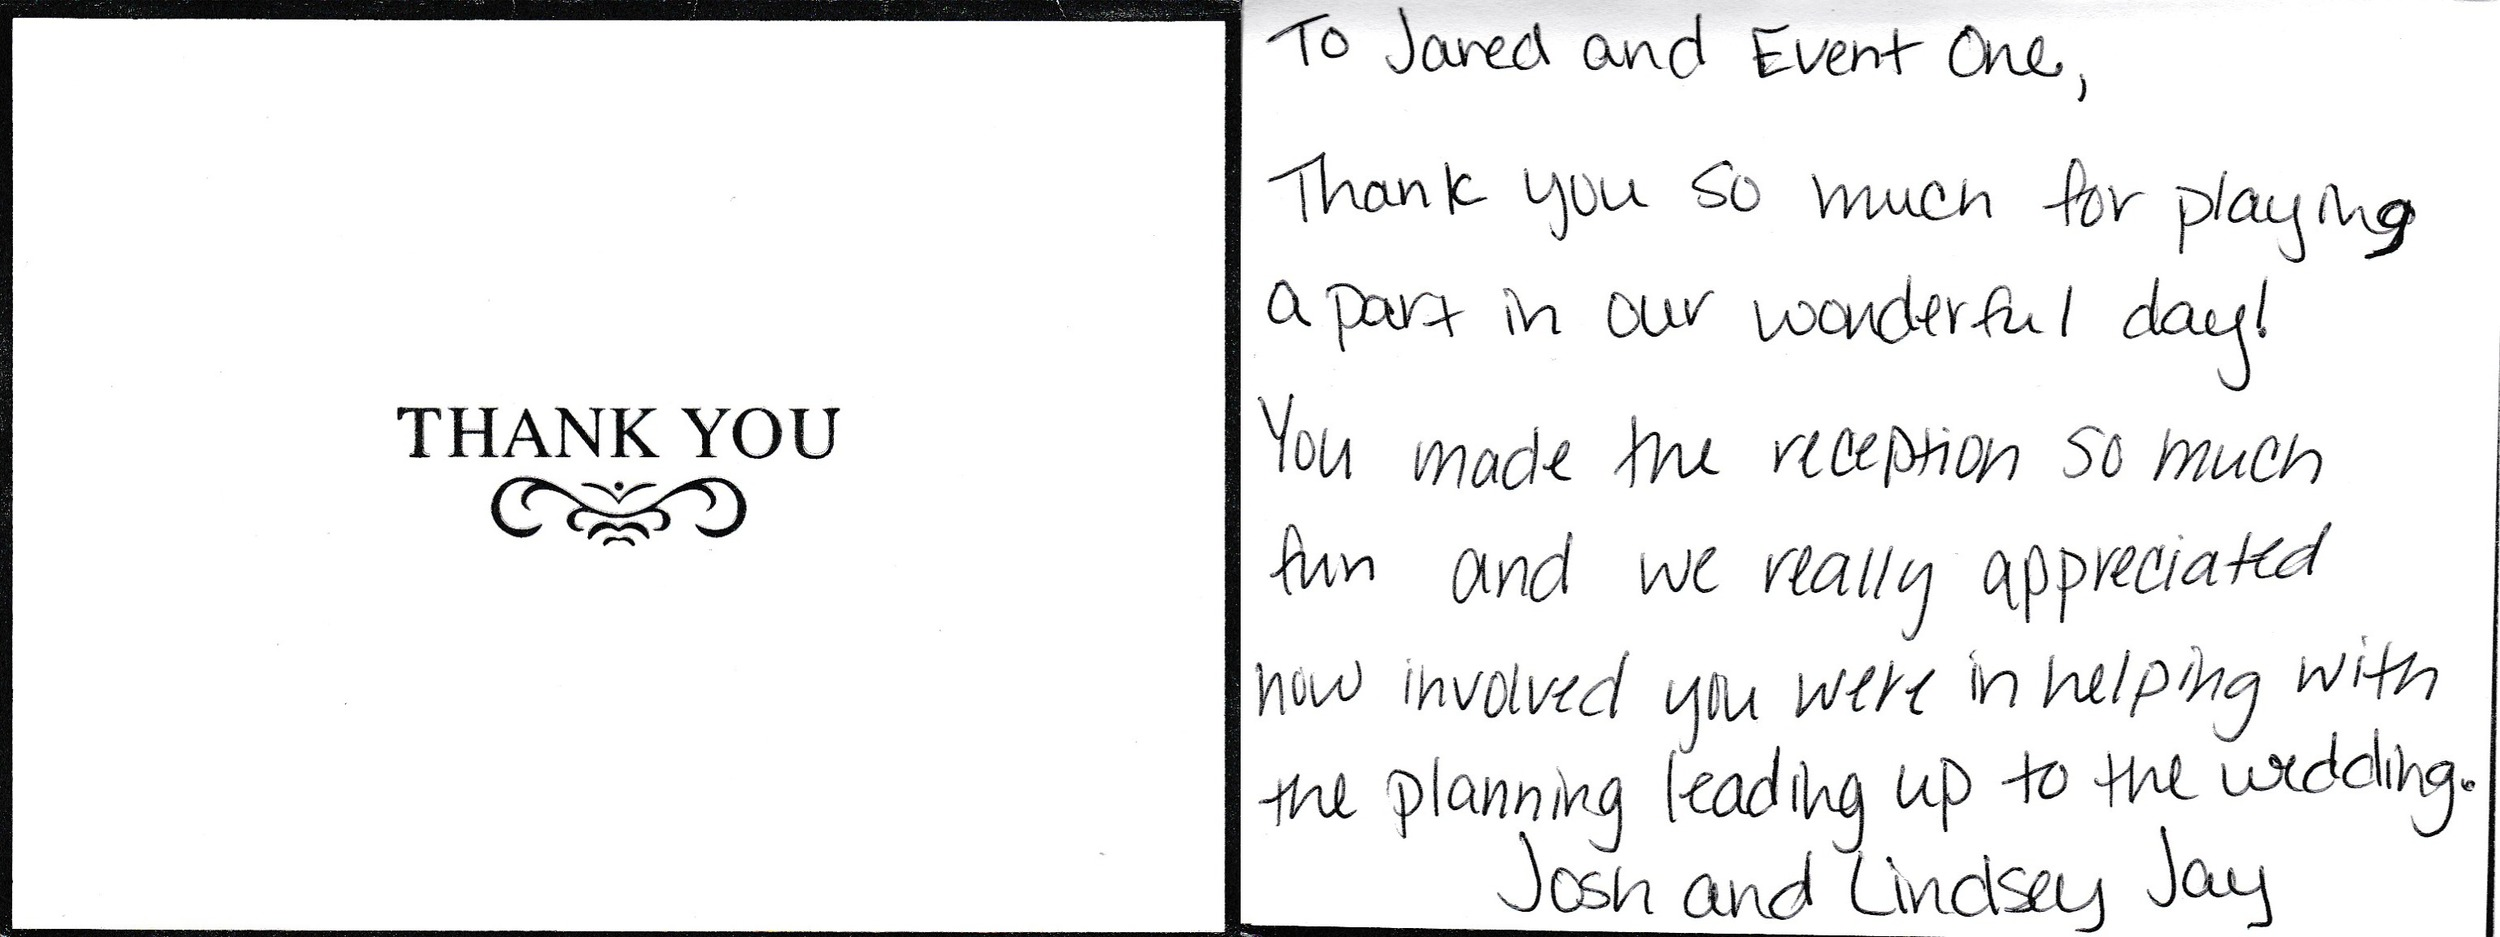 201405161 - Lindsey & Josh Jay - Thank You.jpeg